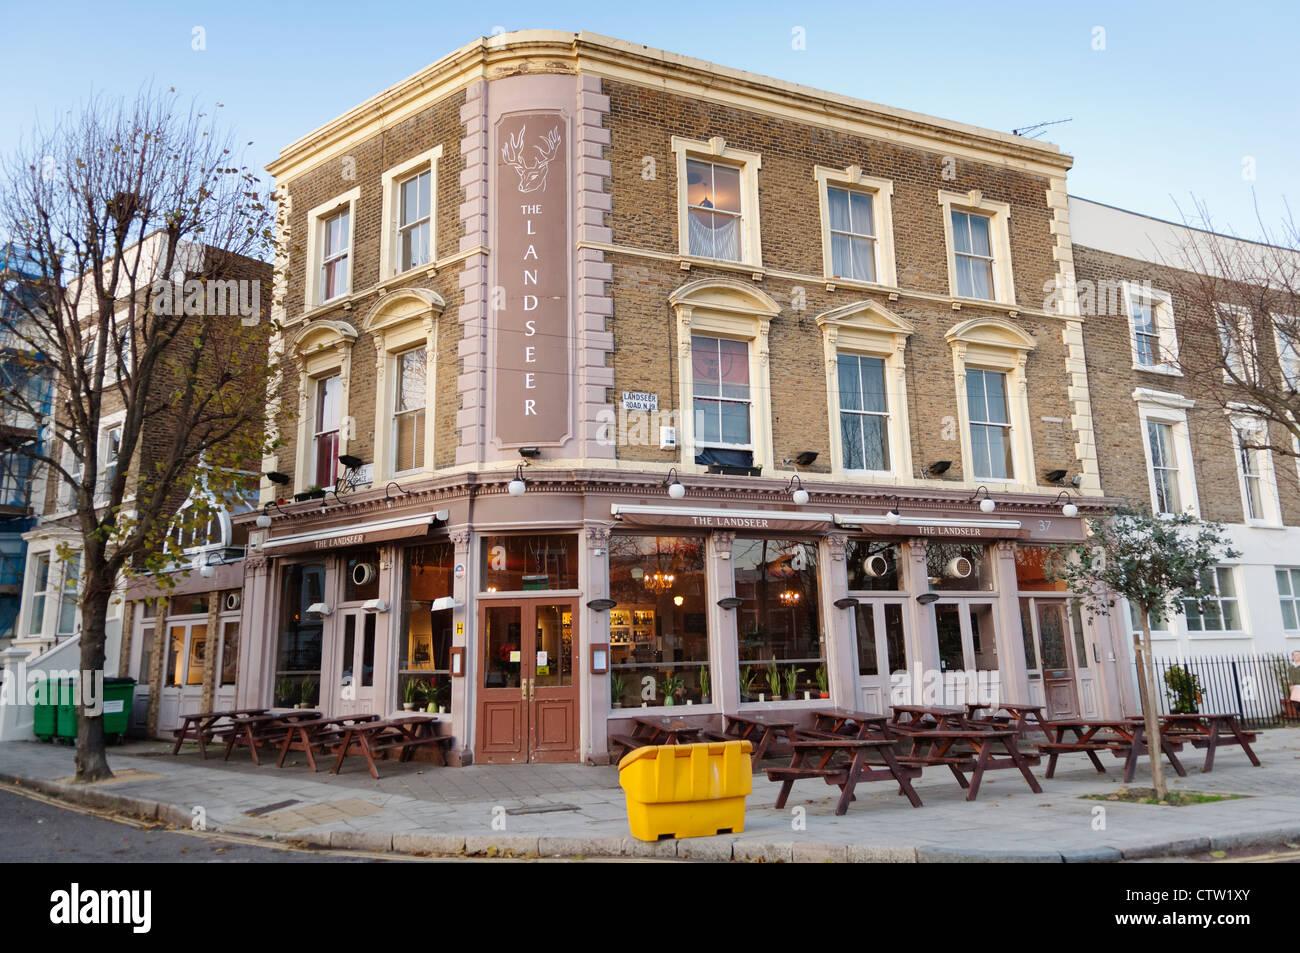 http://c8.alamy.com/comp/CTW1XY/the-landseer-pub-on-landseer-road-in-islington-london-CTW1XY.jpg